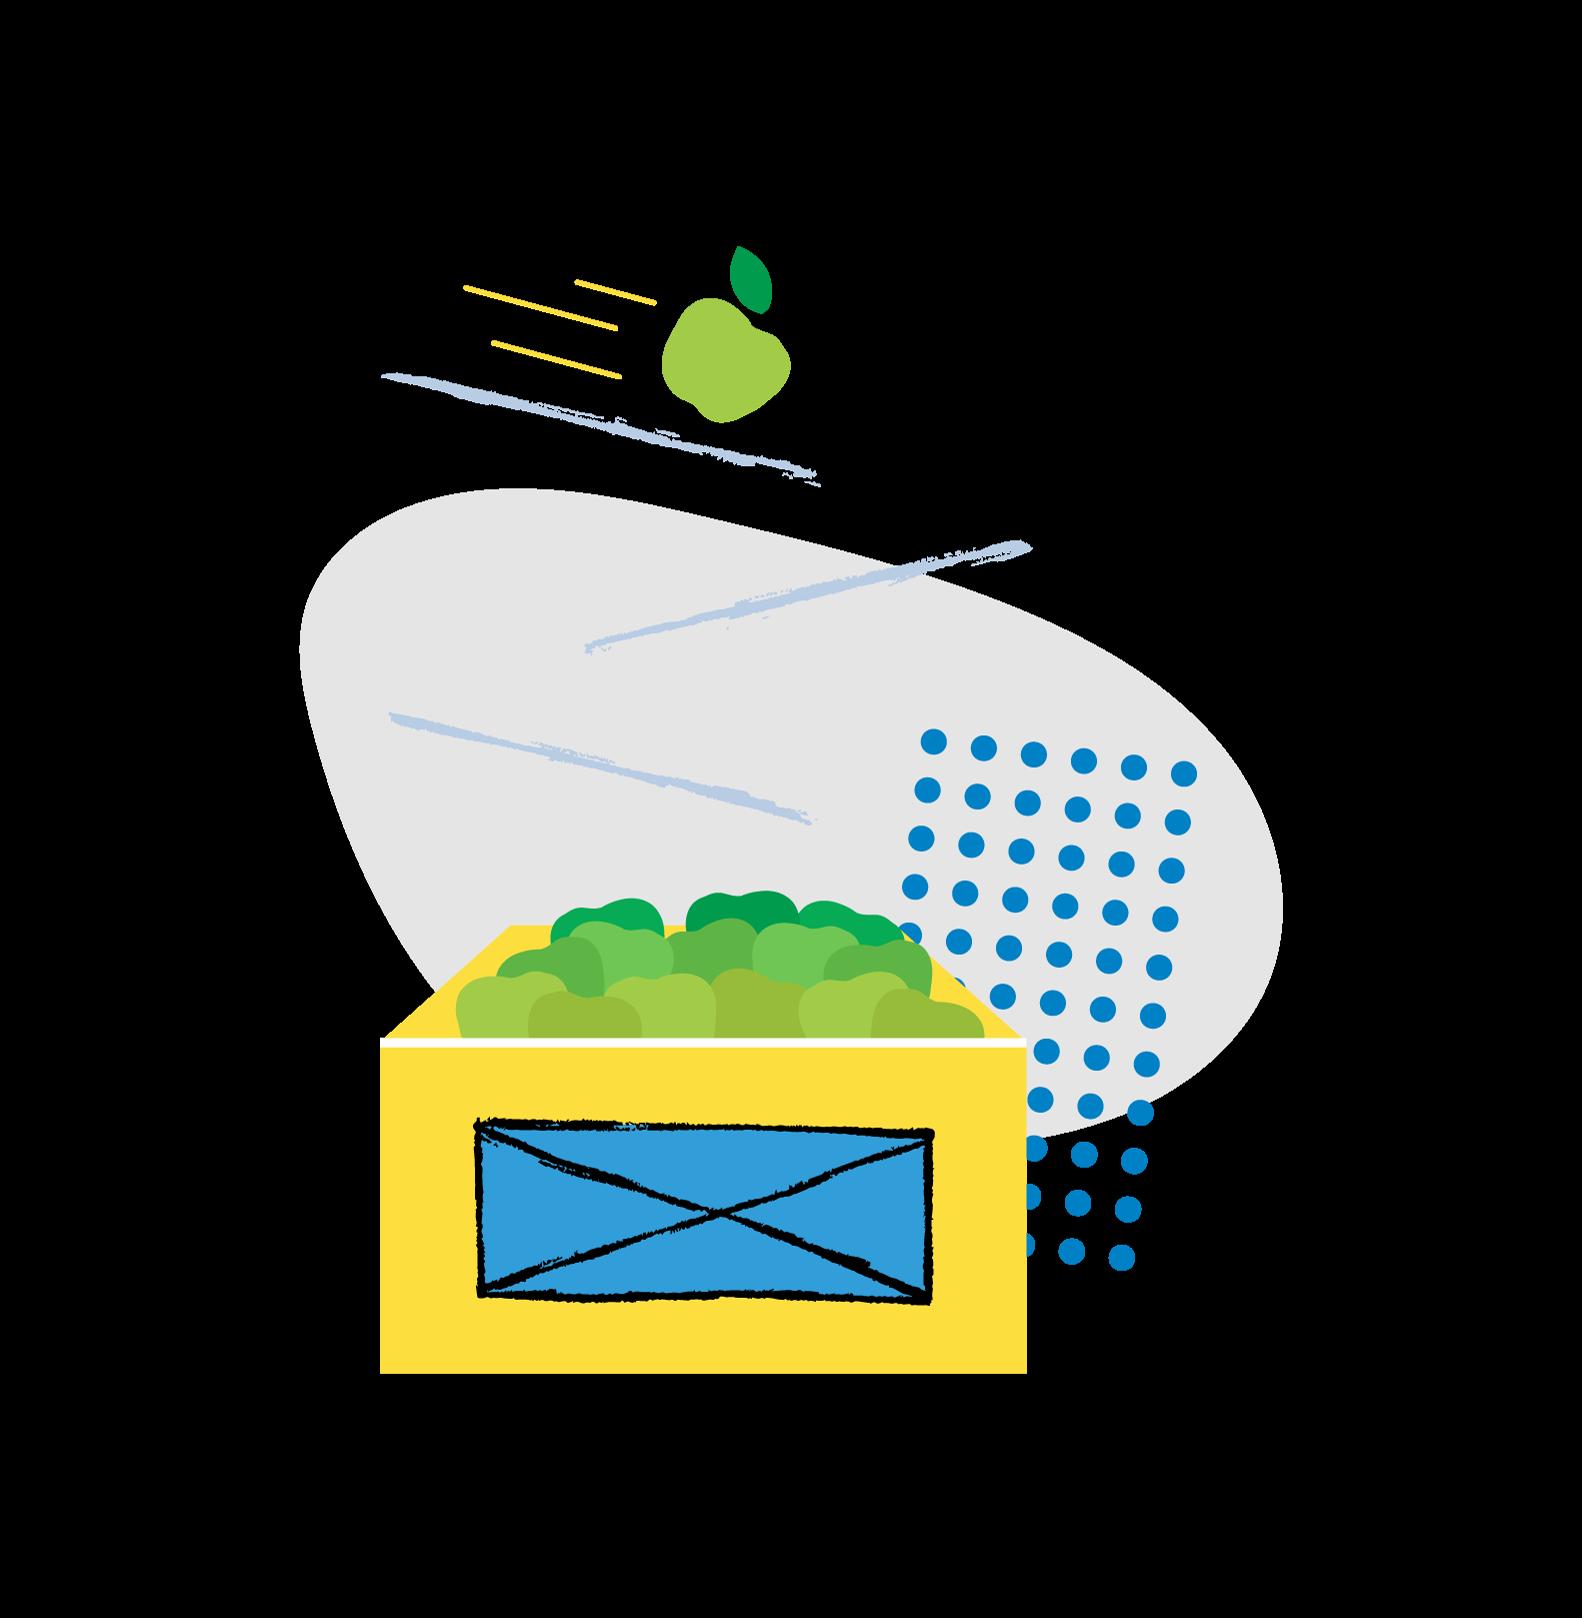 Food box illustration